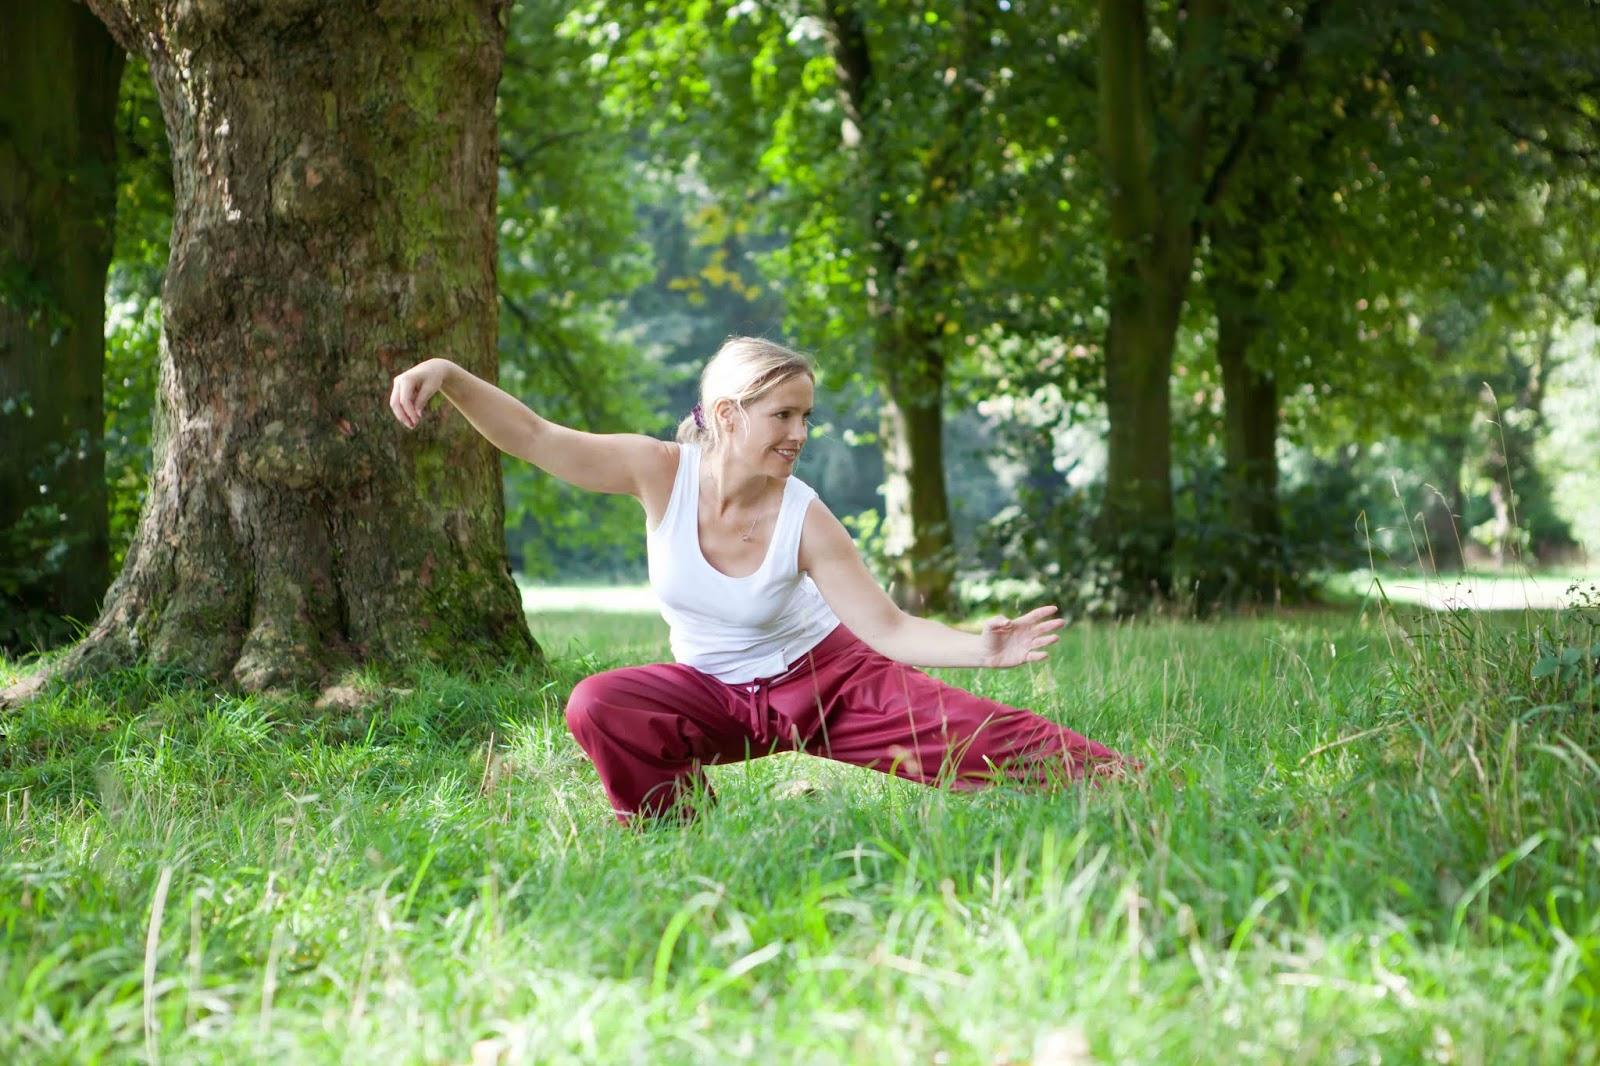 Frau mit roter Hose im Park bei Gymnastik